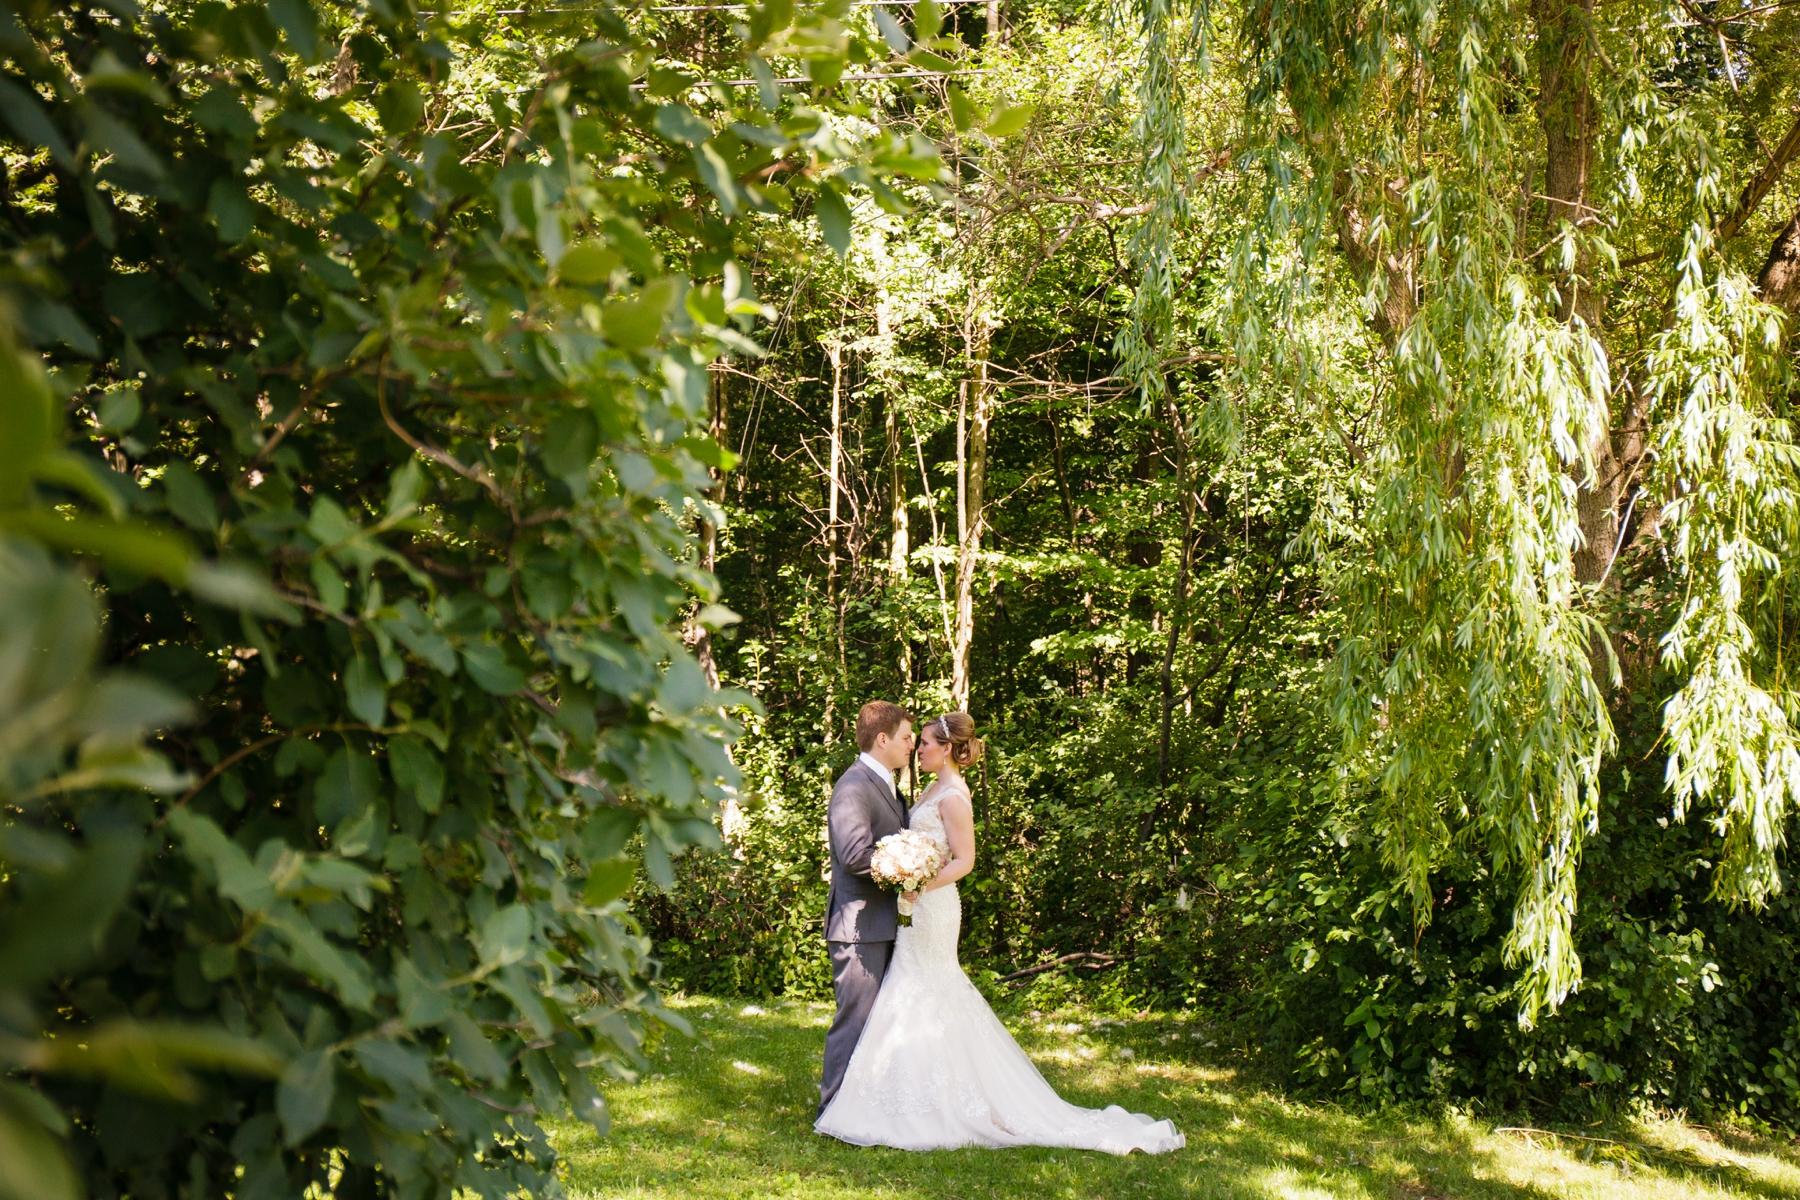 Ben_Jillian_Midland_Baycity_Wedding_0049.jpg